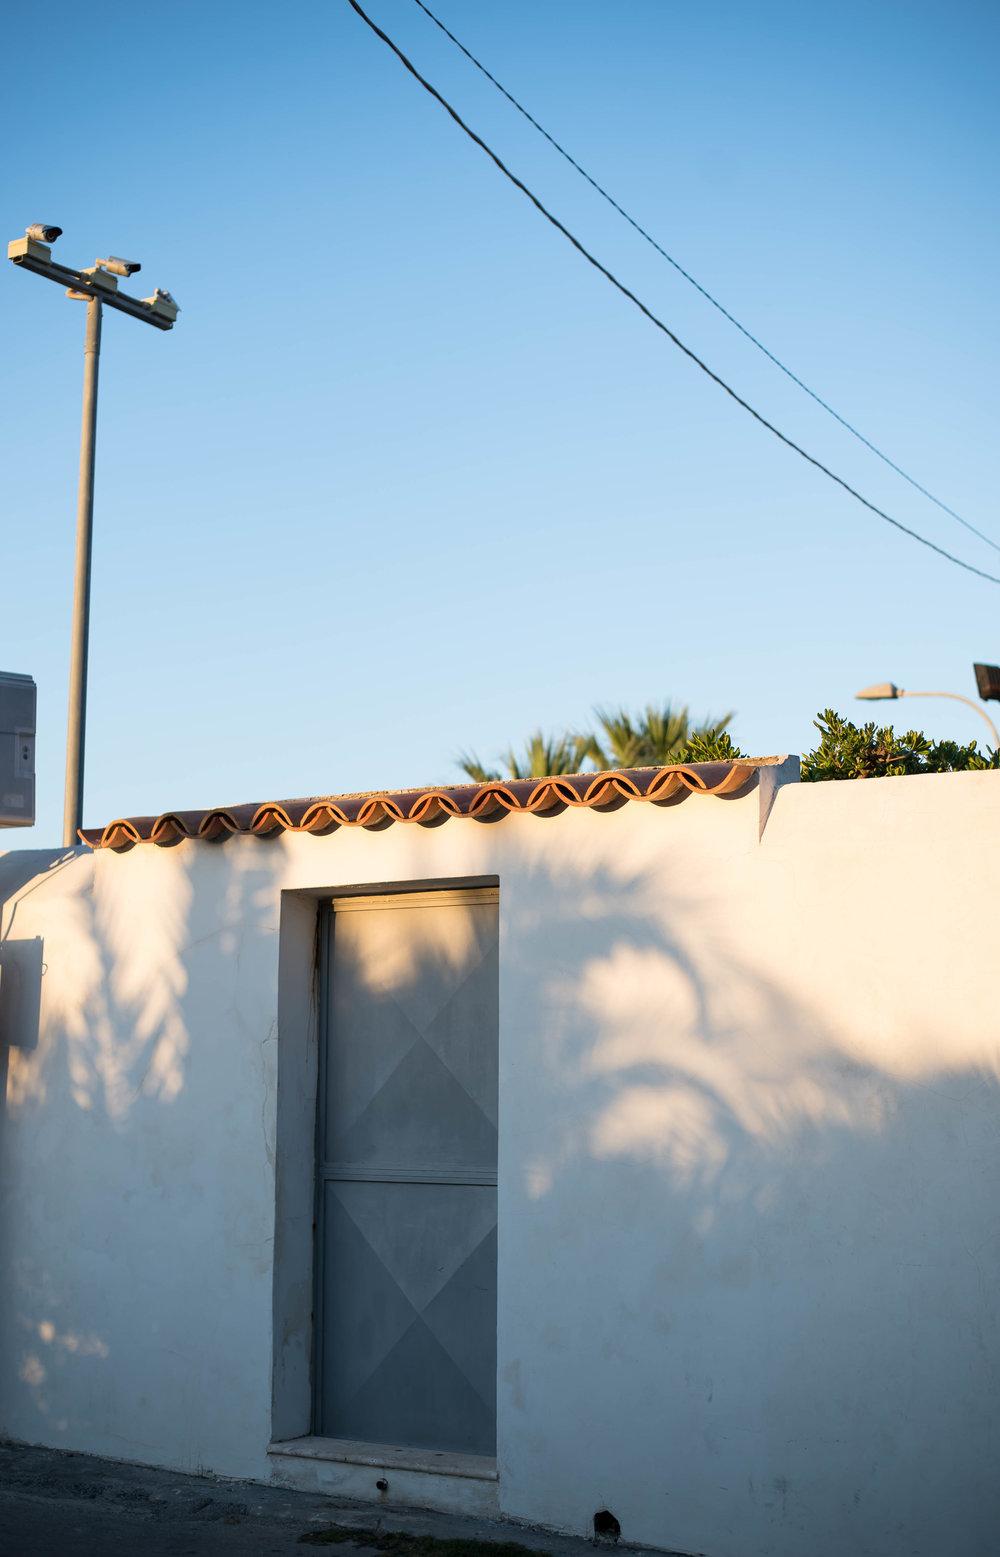 2015_09_23 brucoli_sicilia_italia palms shadows 1 V1.jpg